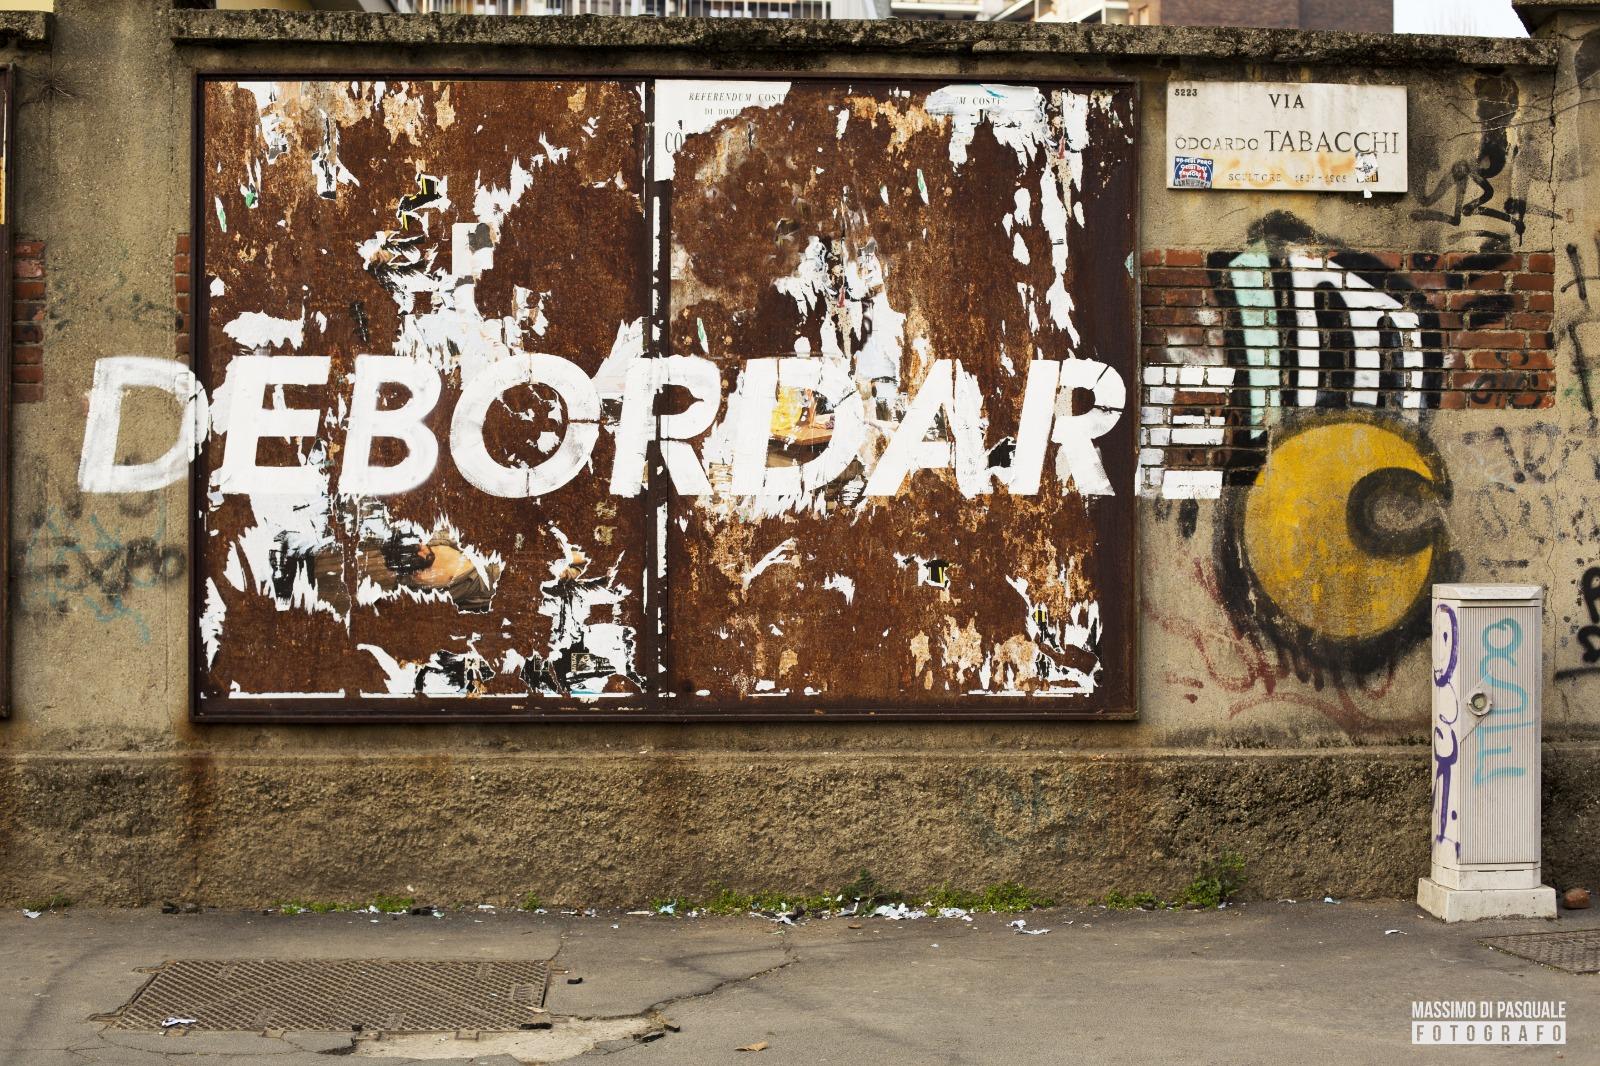 MisterCaos:poesia di strada:Debordare